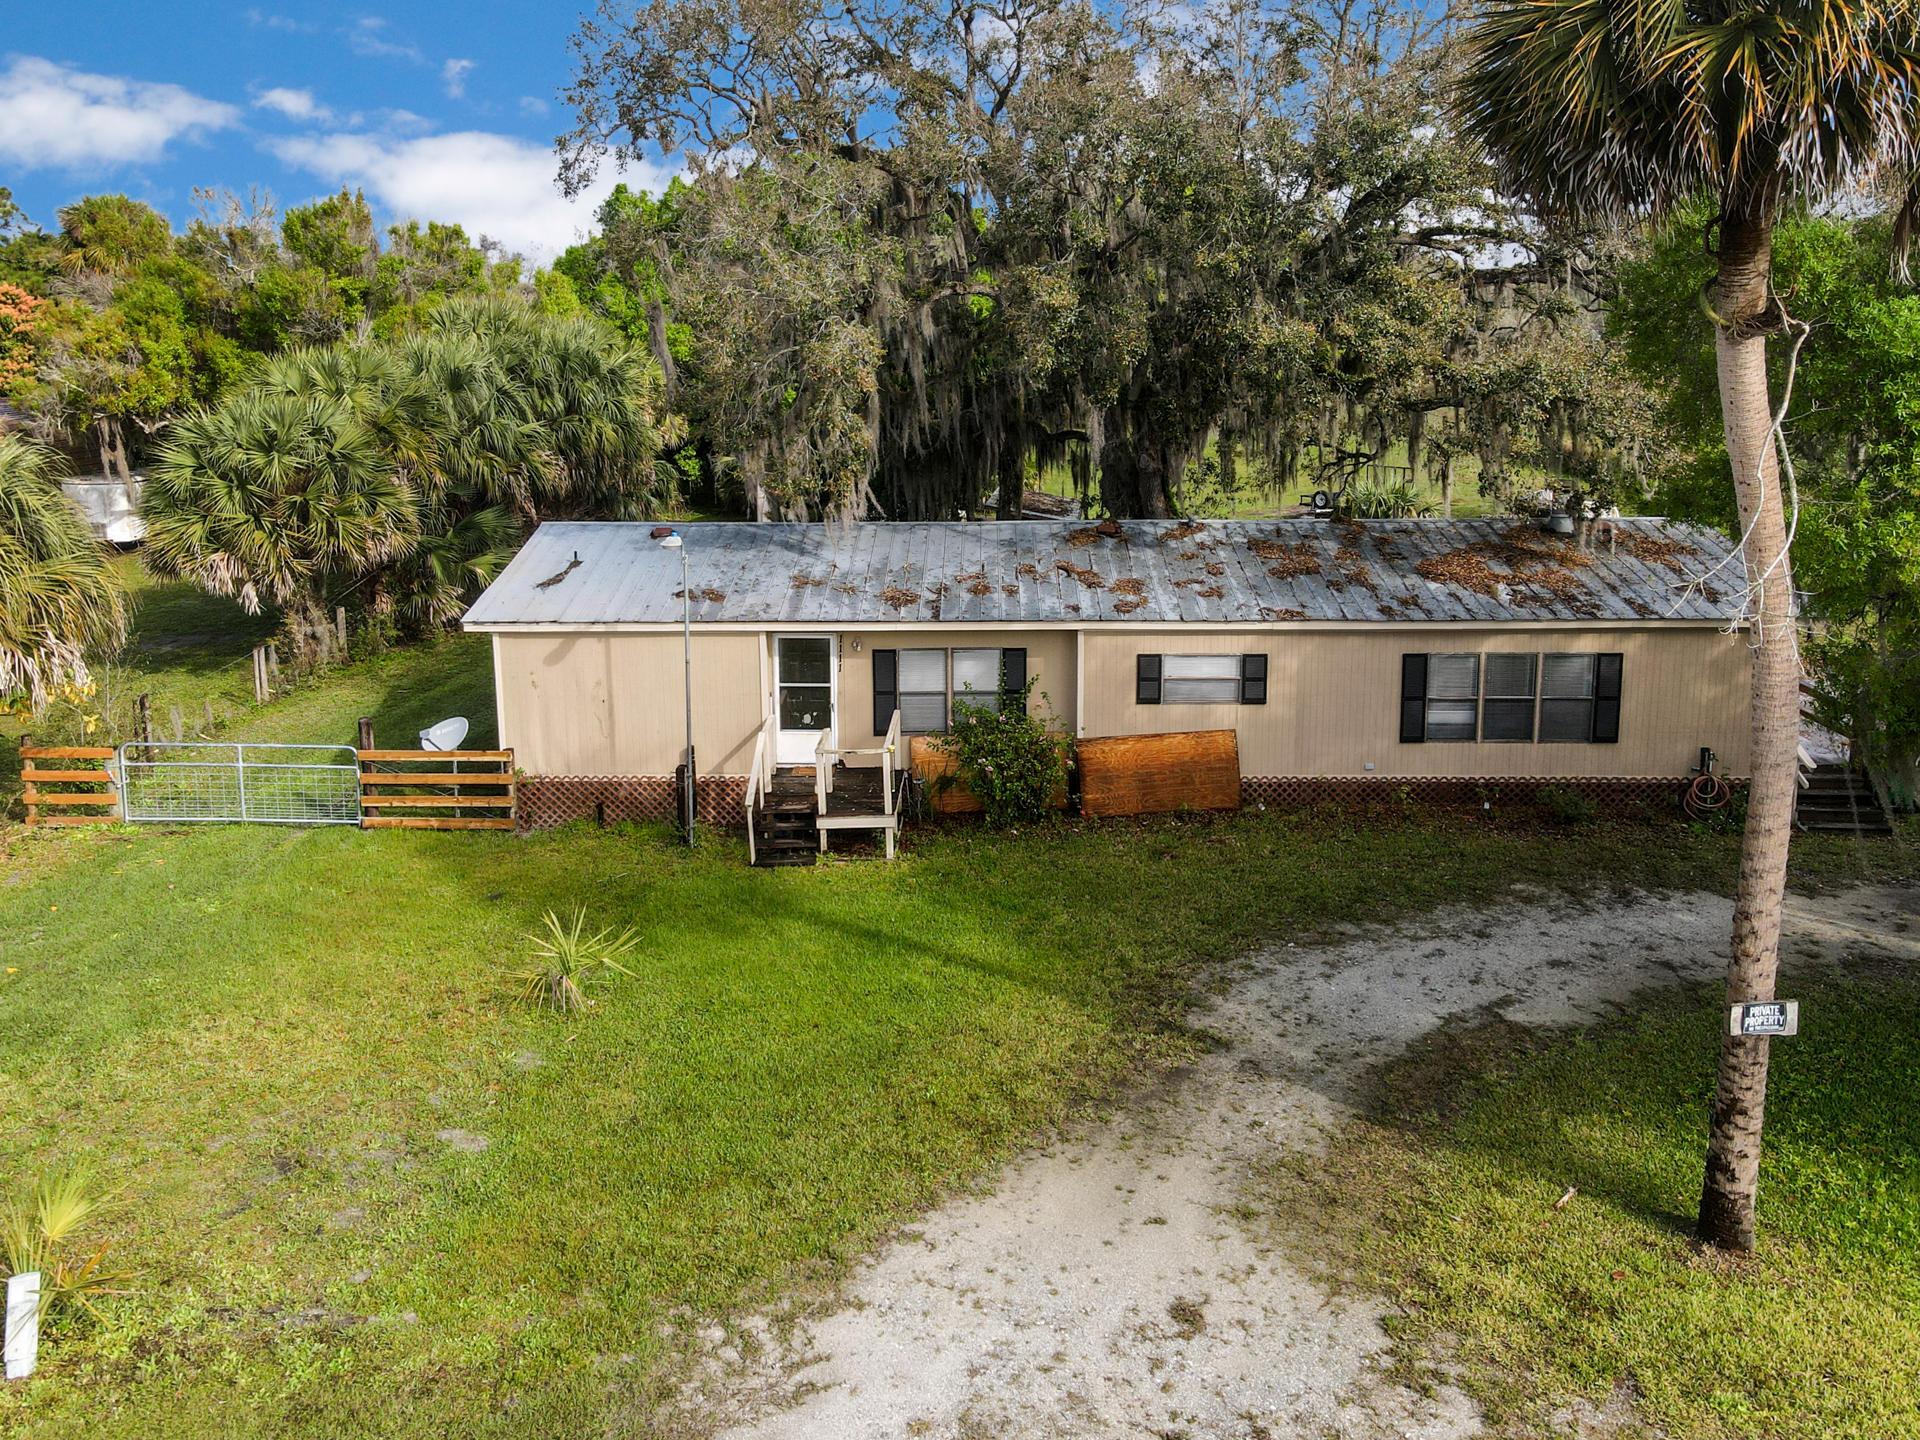 Okeechobee, FL 34974 photo 20